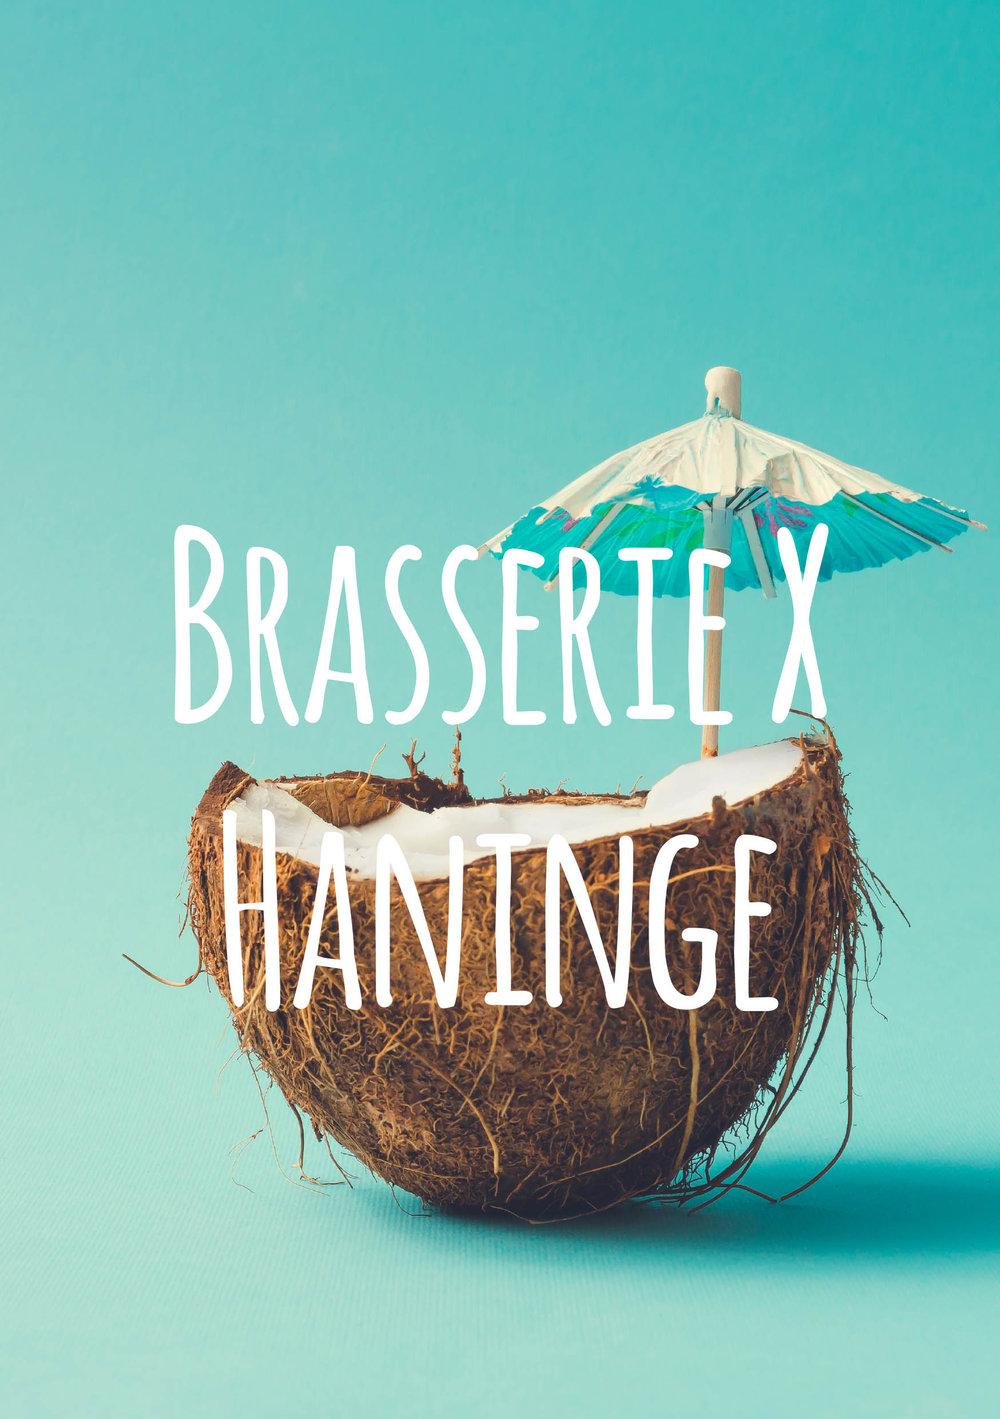 brasseriex_haninge.jpg